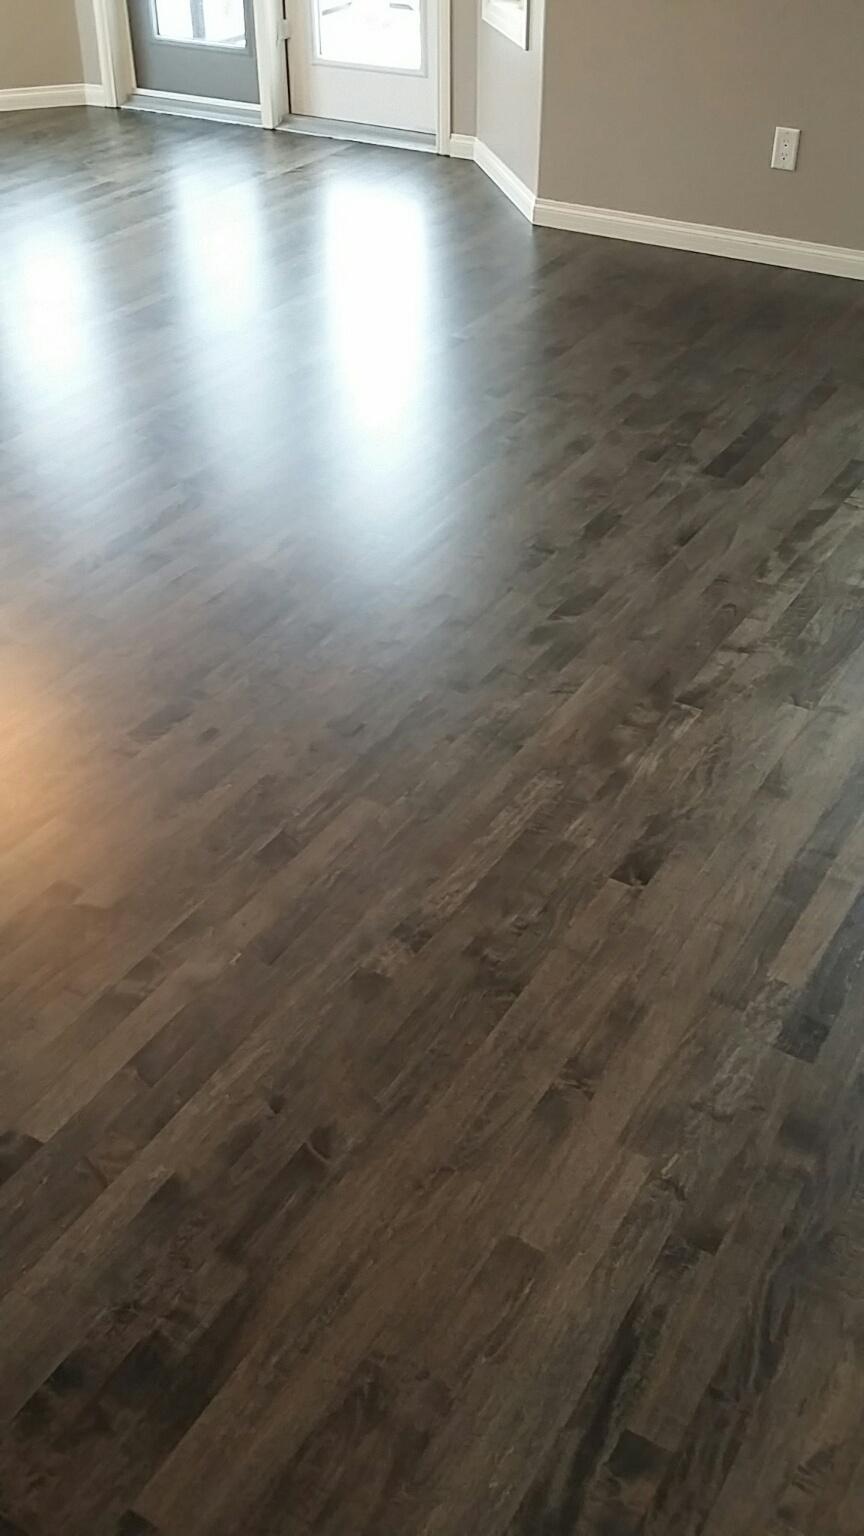 Refinished hardwood flooring gallery edmonton alberta area for Hardwood floors edmonton